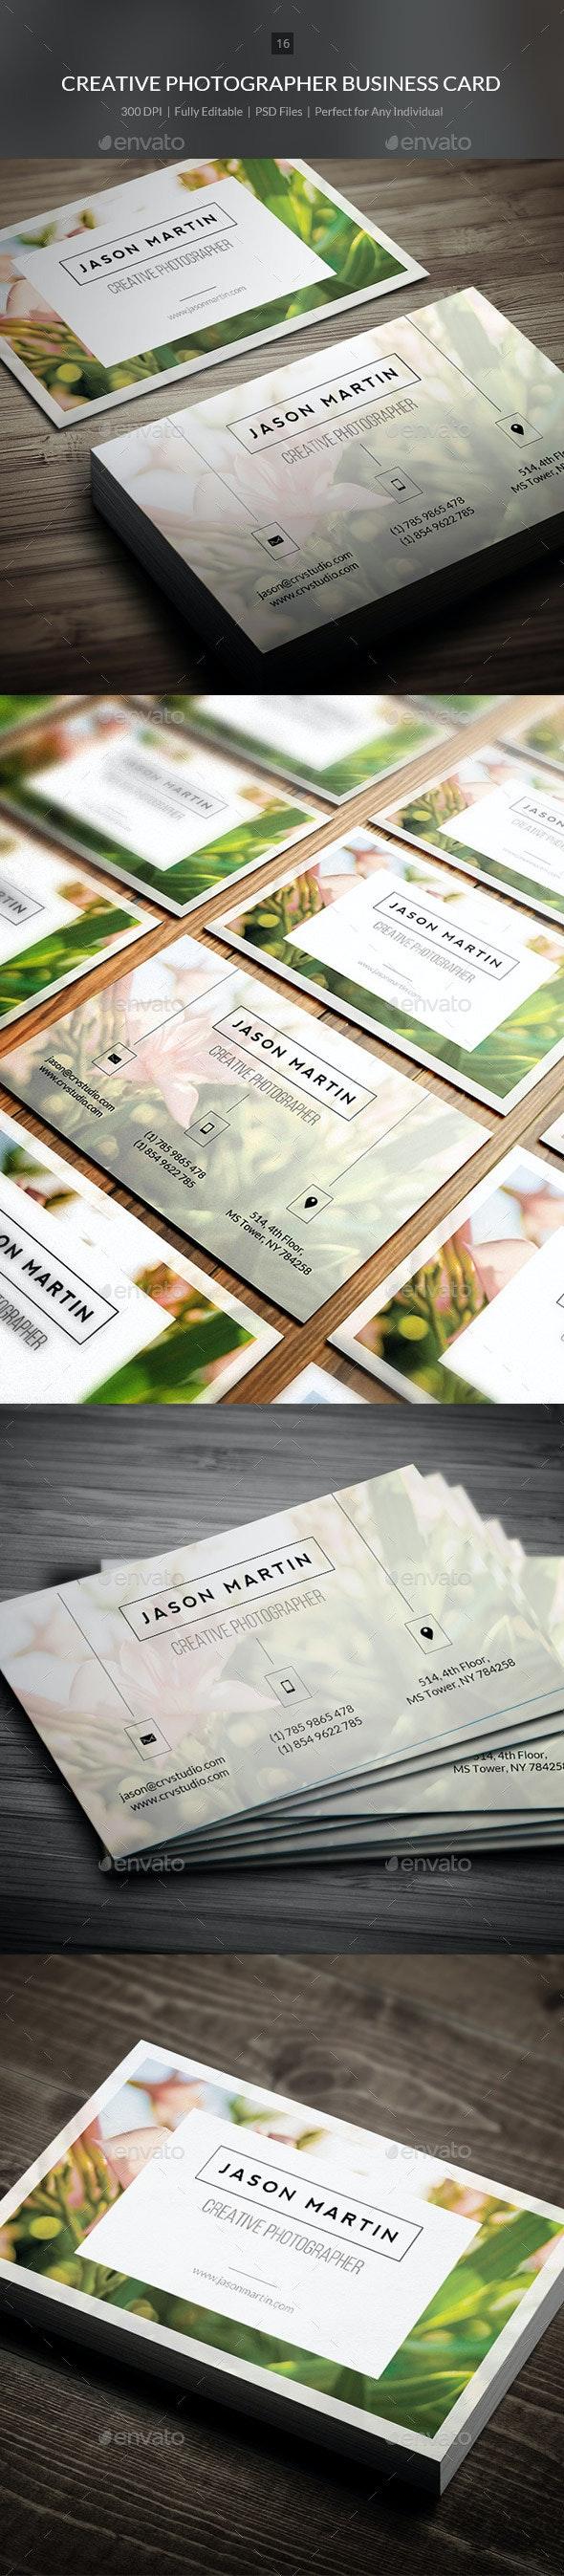 Creative Photographer Business Card - 14 - Creative Business Cards